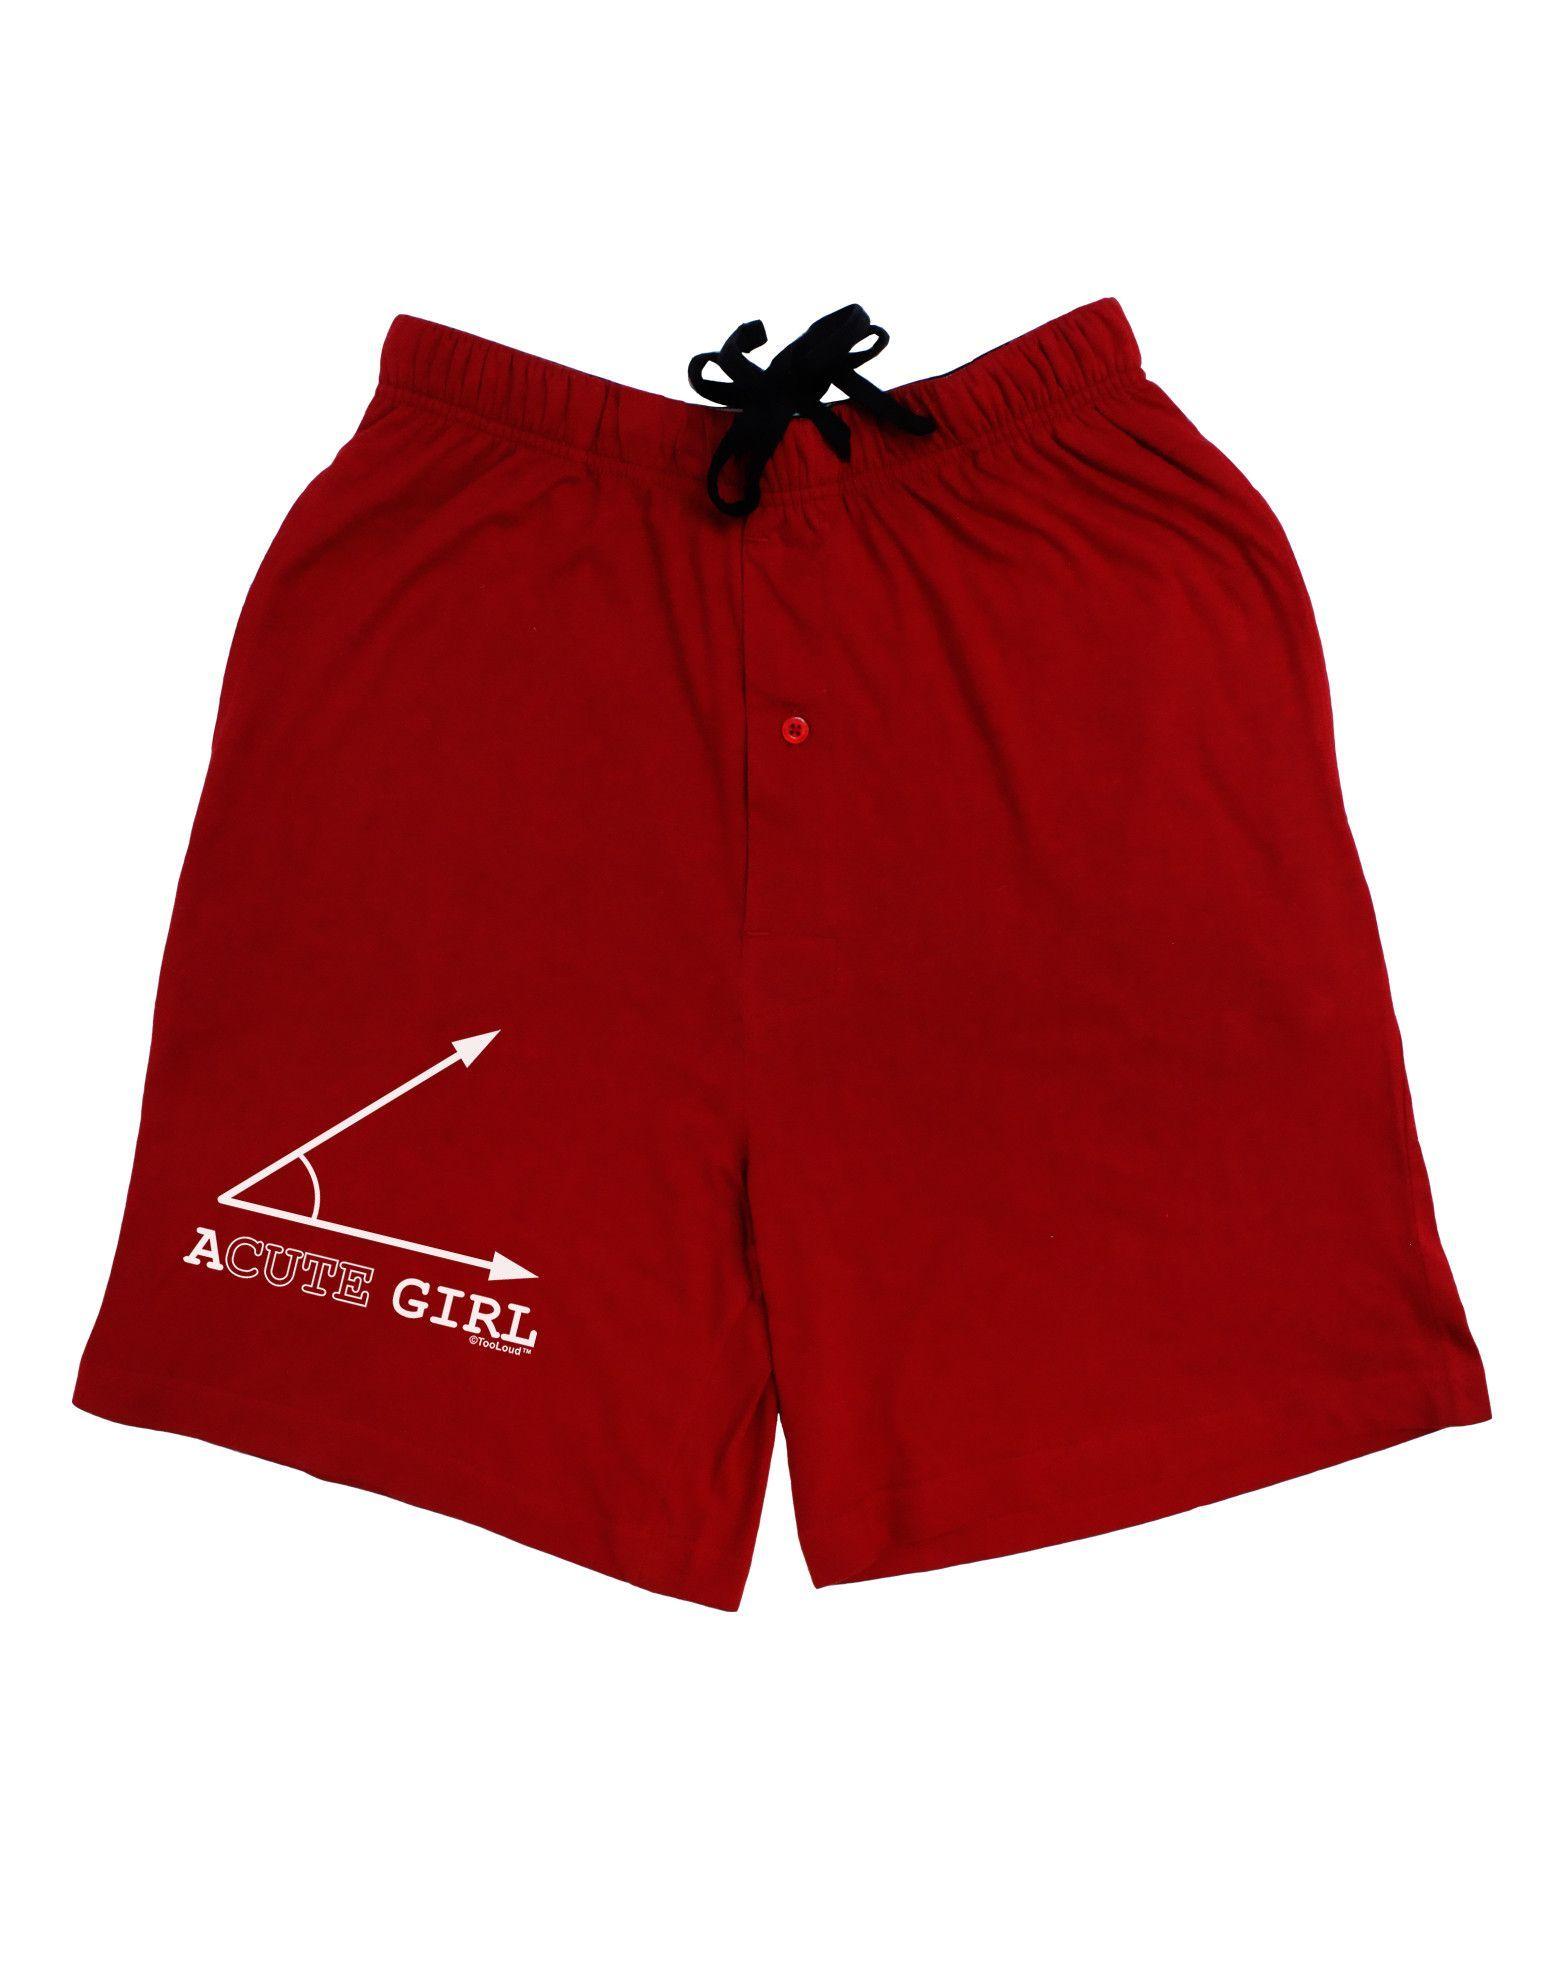 TooLoud Acute Girl Adult Lounge Shorts